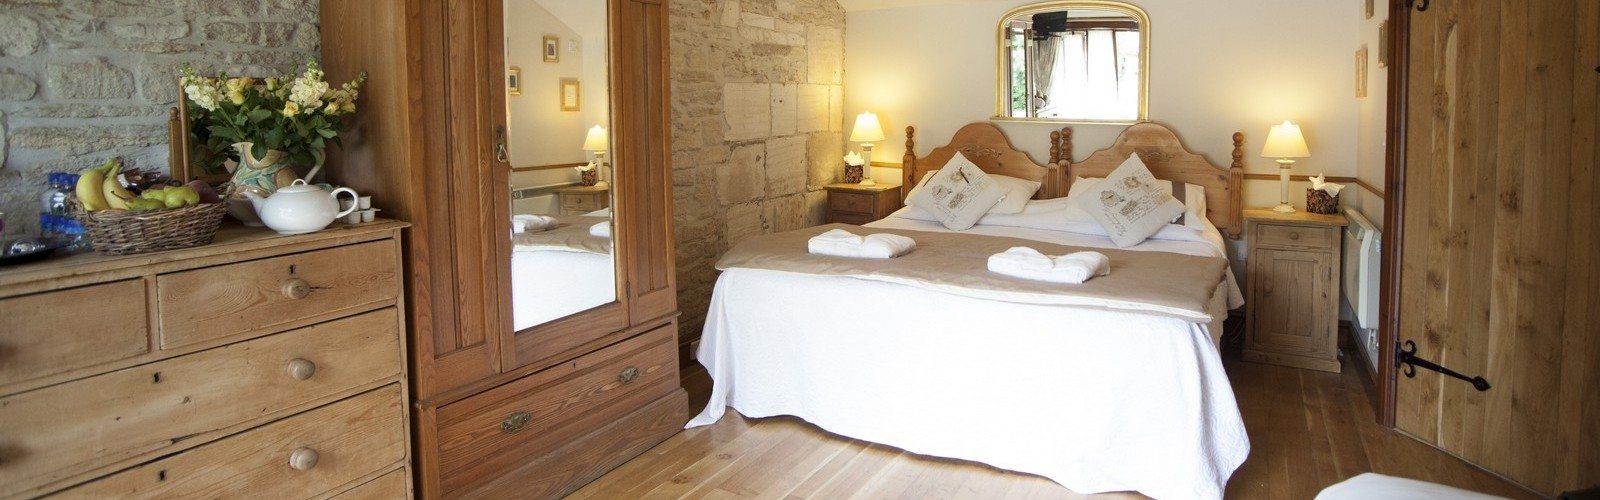 Bradford On Avon Bed And Breakfast Accommodation